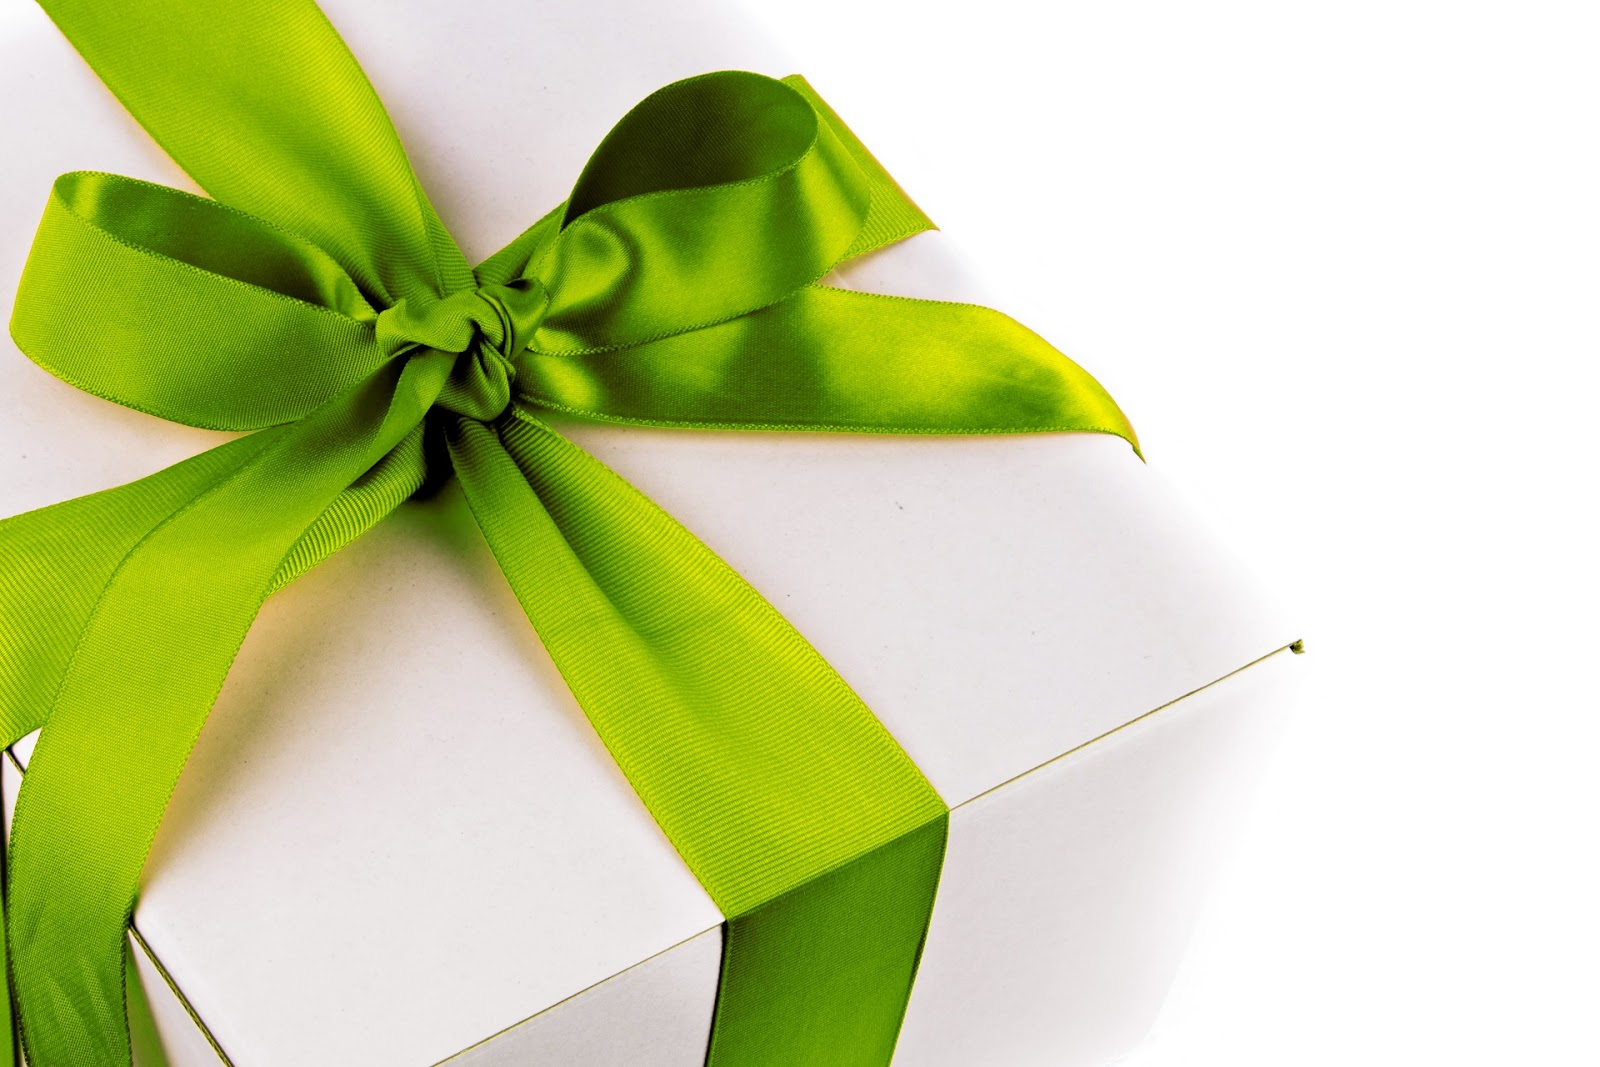 christmas-gift-box-14109688168Ik-2.jpg